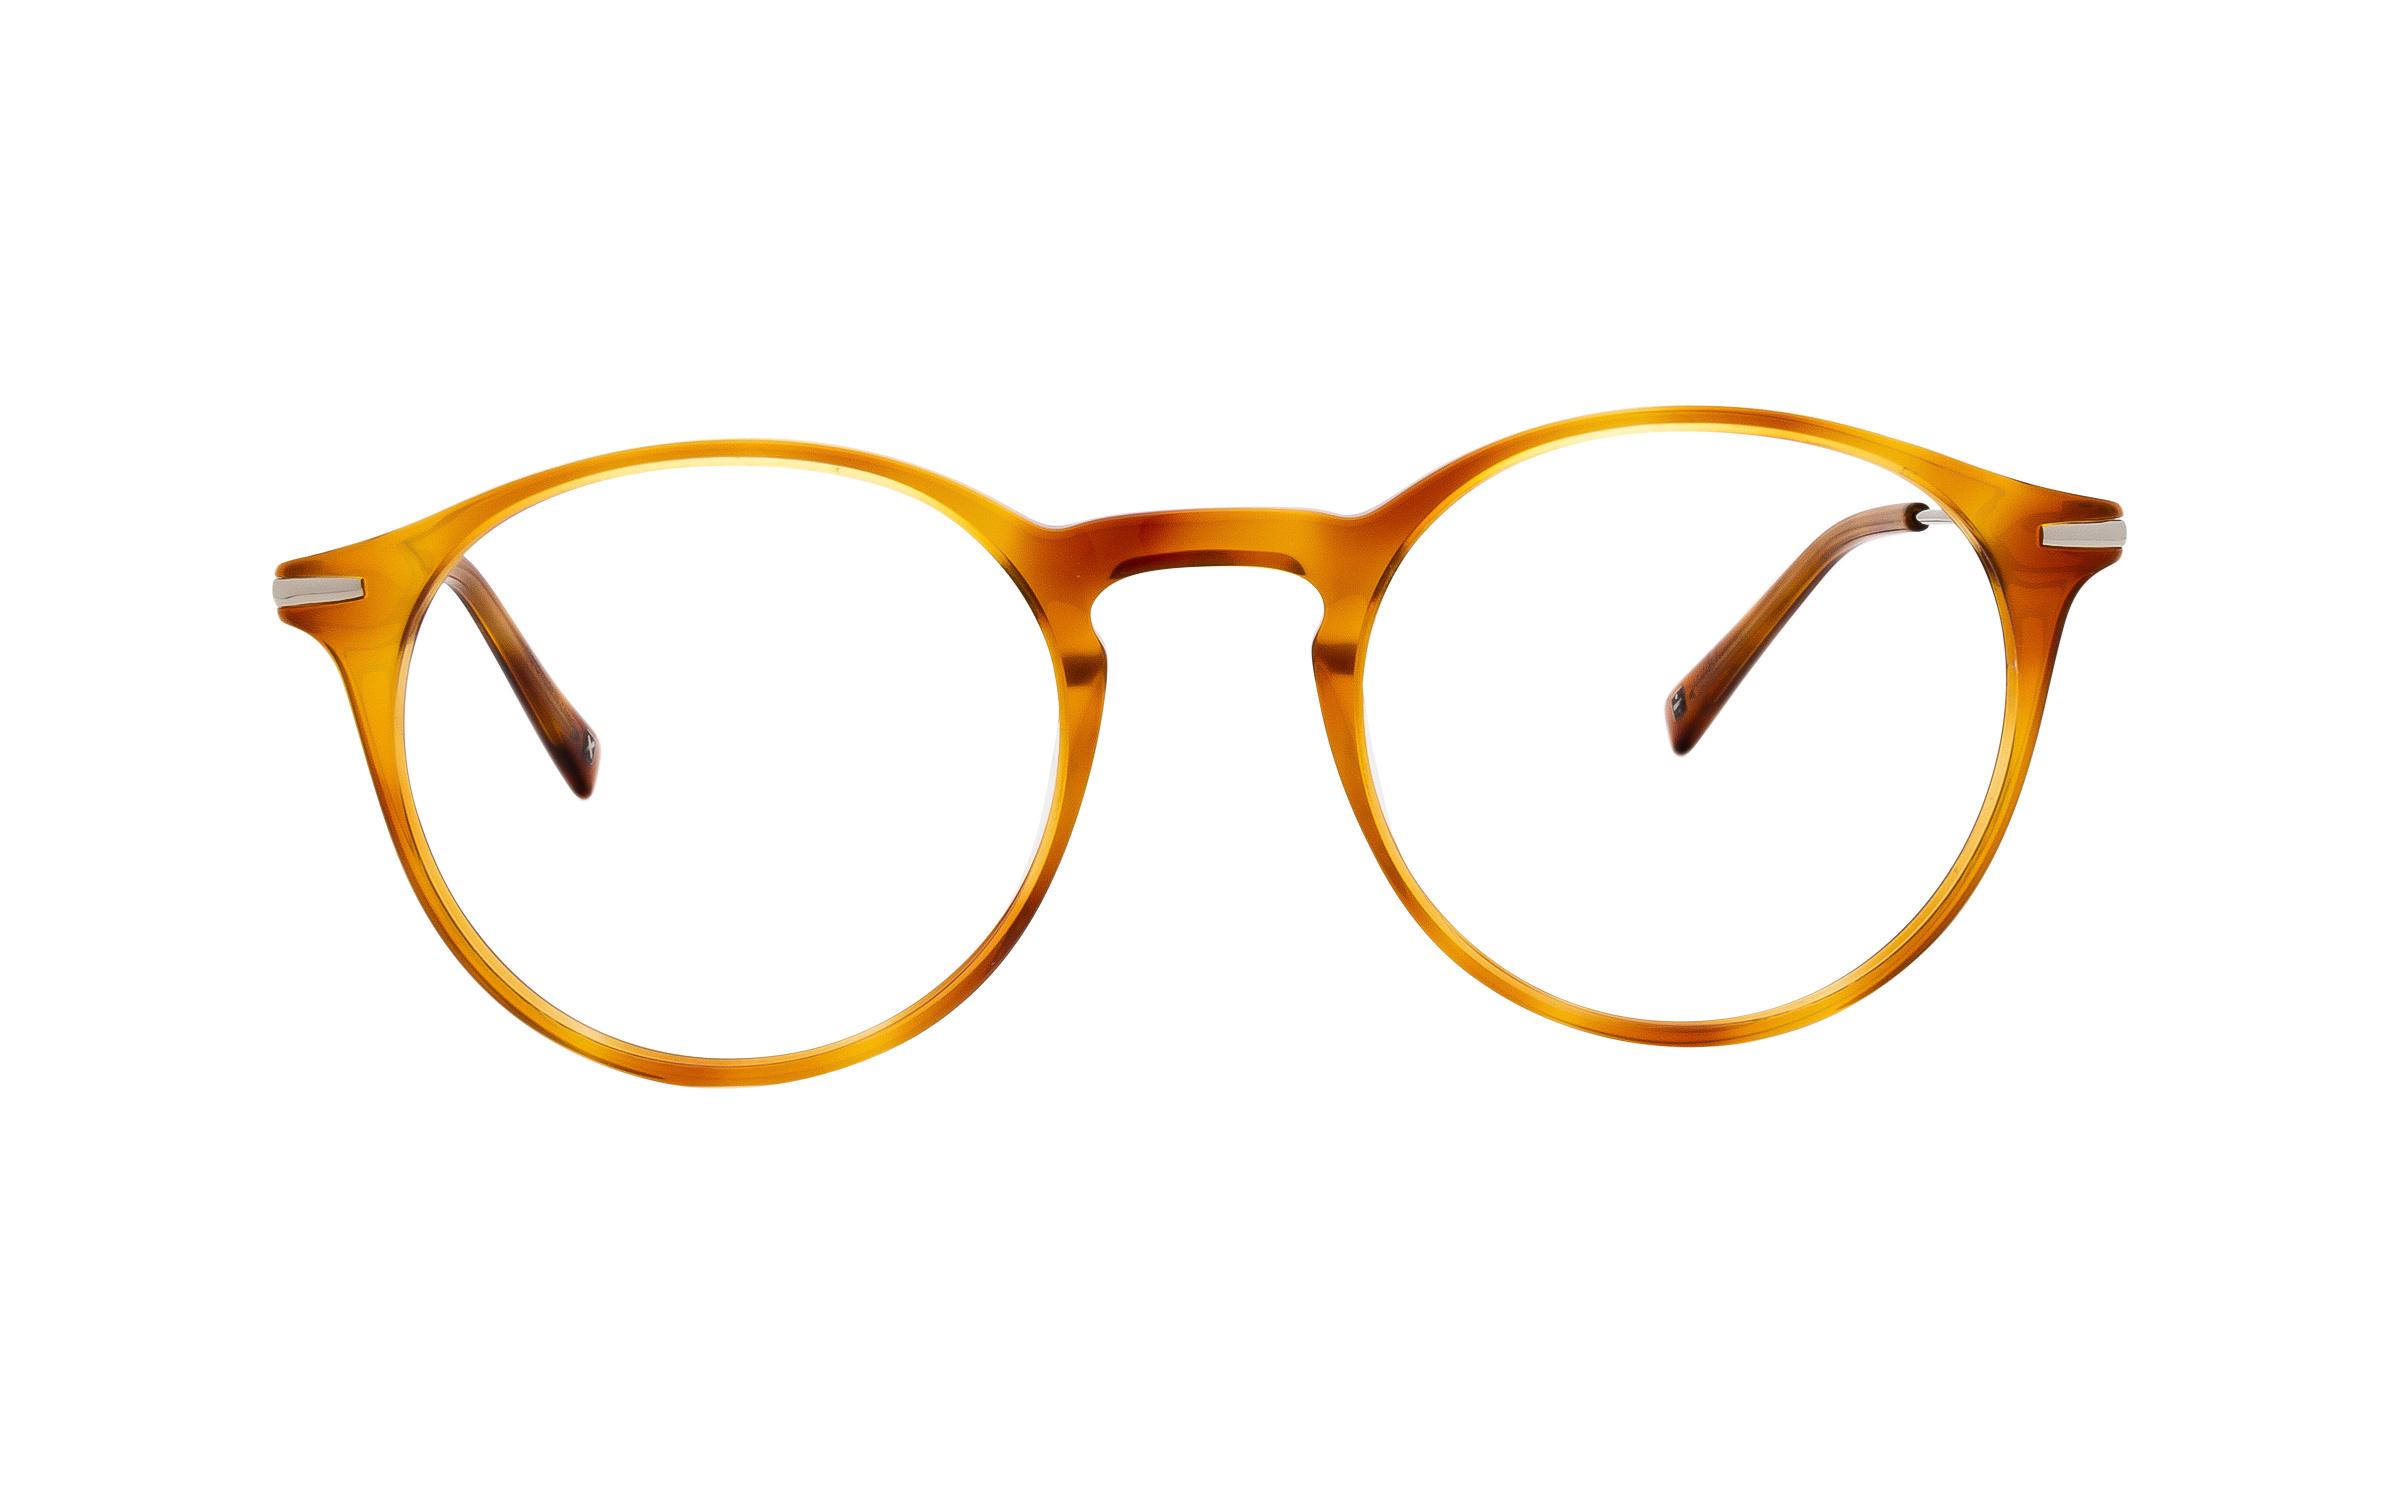 http://www.coastal.com/ - Derek Cardigan Dorado DC235 C03 (48) Eyeglasses and Frame in Shiny Honey Havana Tortoise | Acetate/Metal – Online Coastal